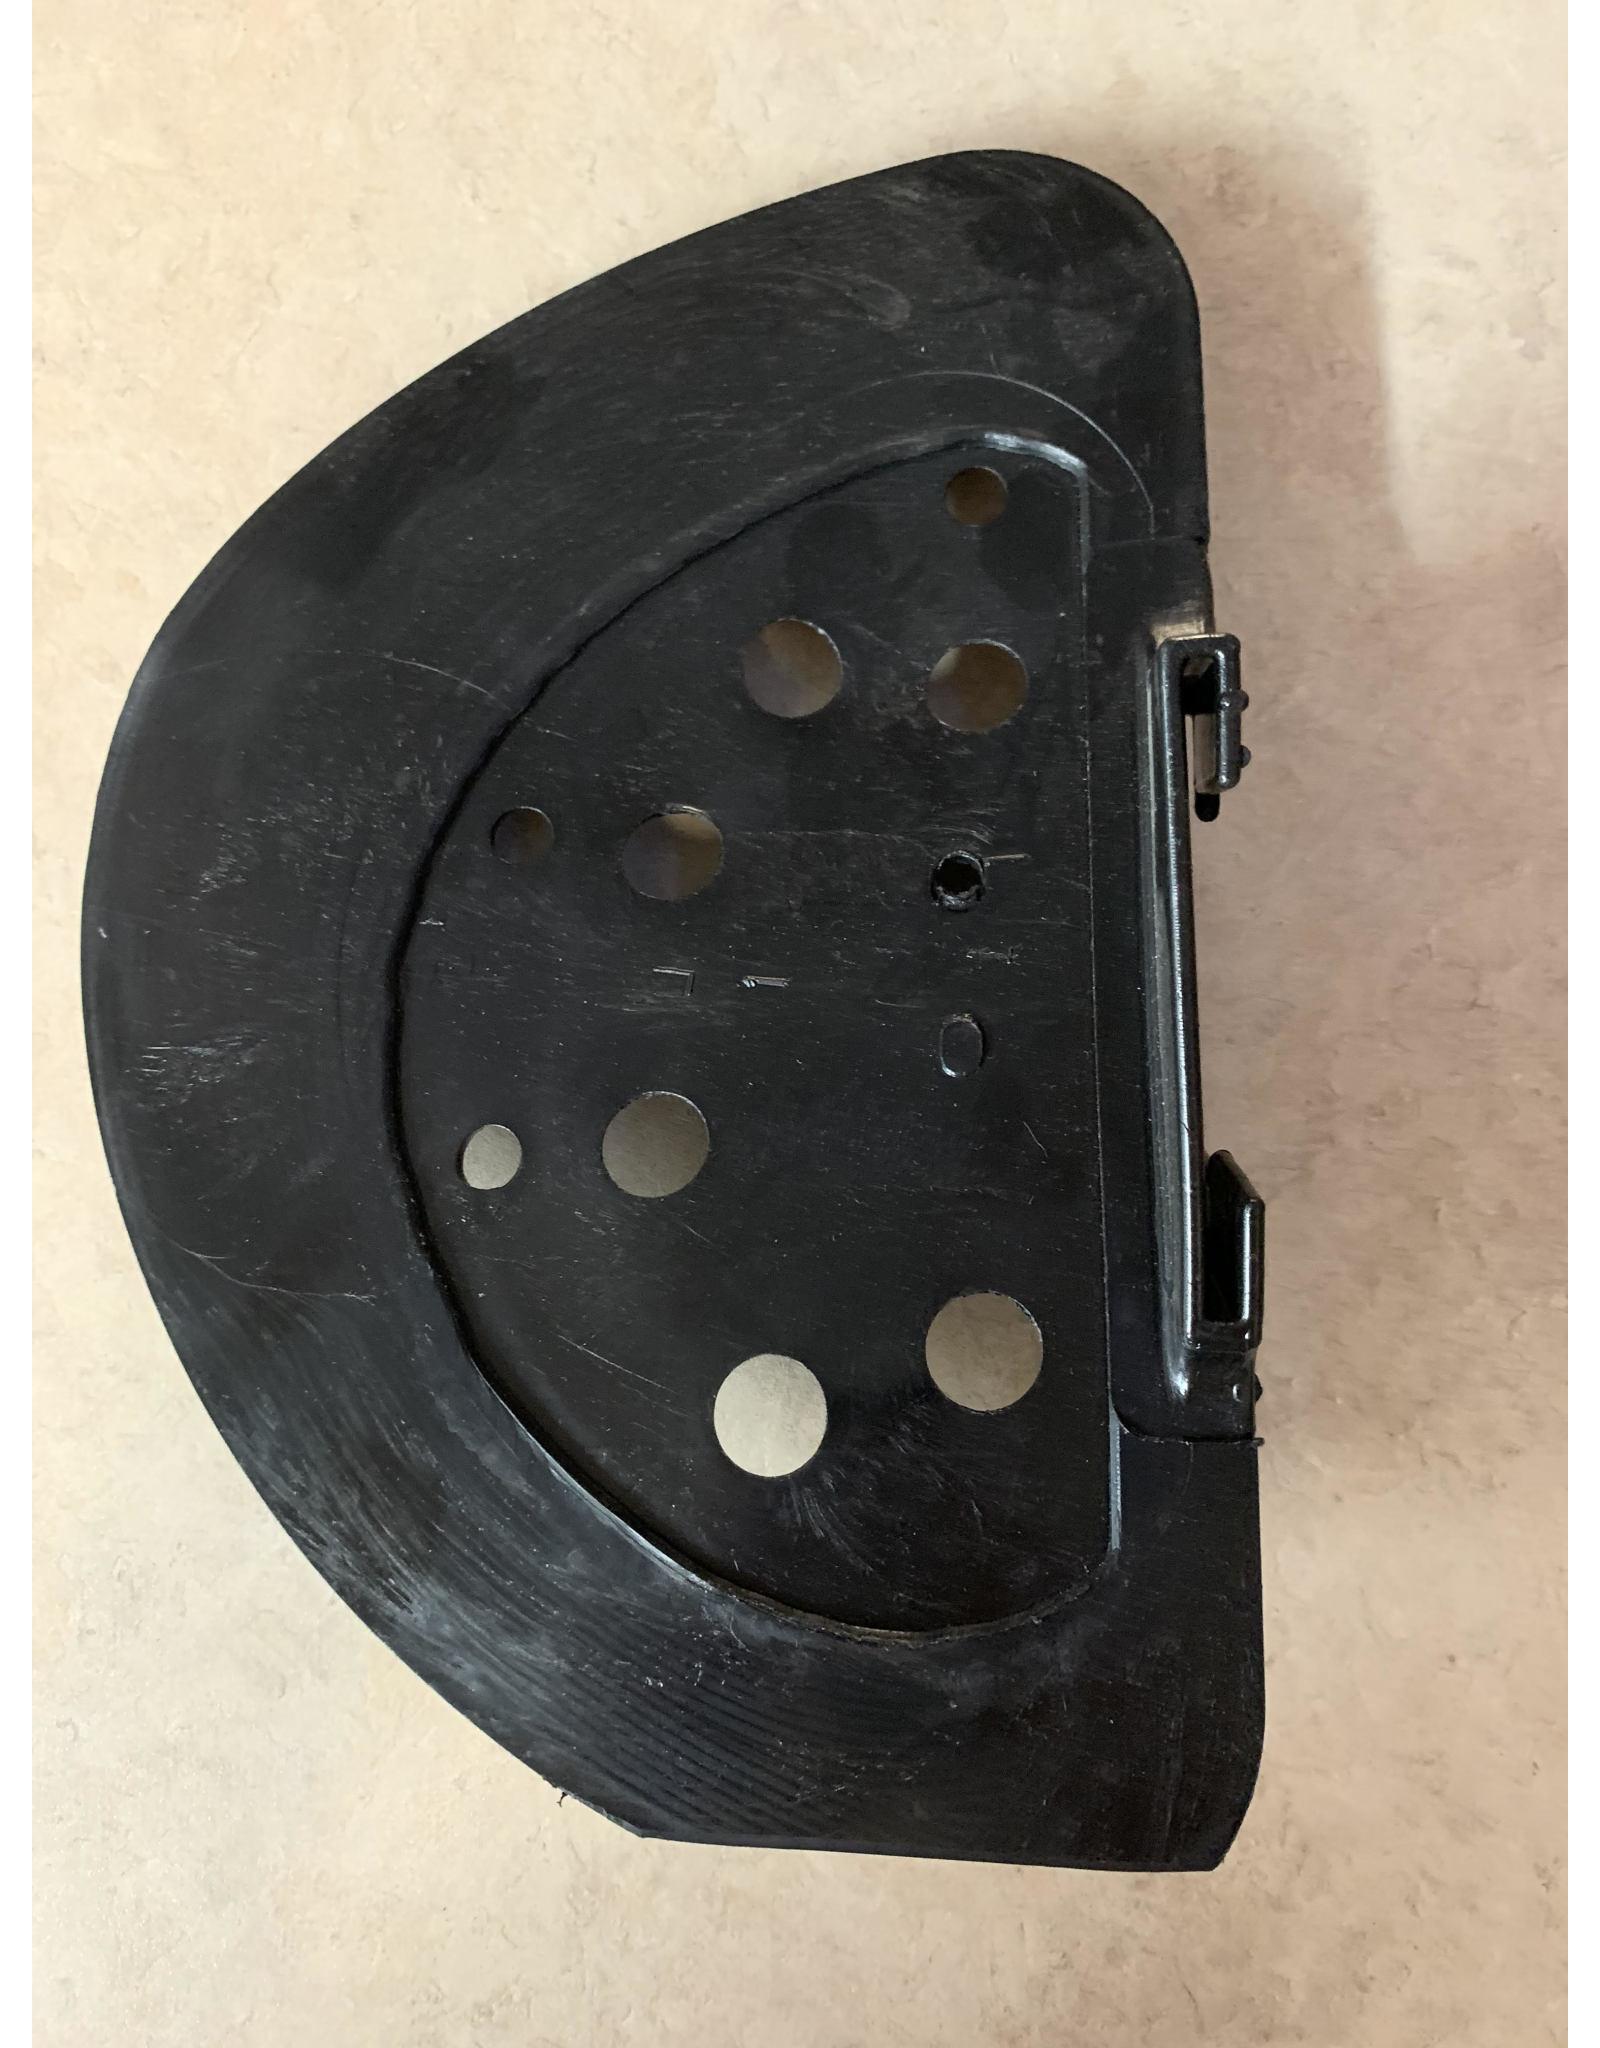 Jackson Kayaks Jackson Acc. Cale pieds large gauche - Zen large Left, Large Footplate/Slider